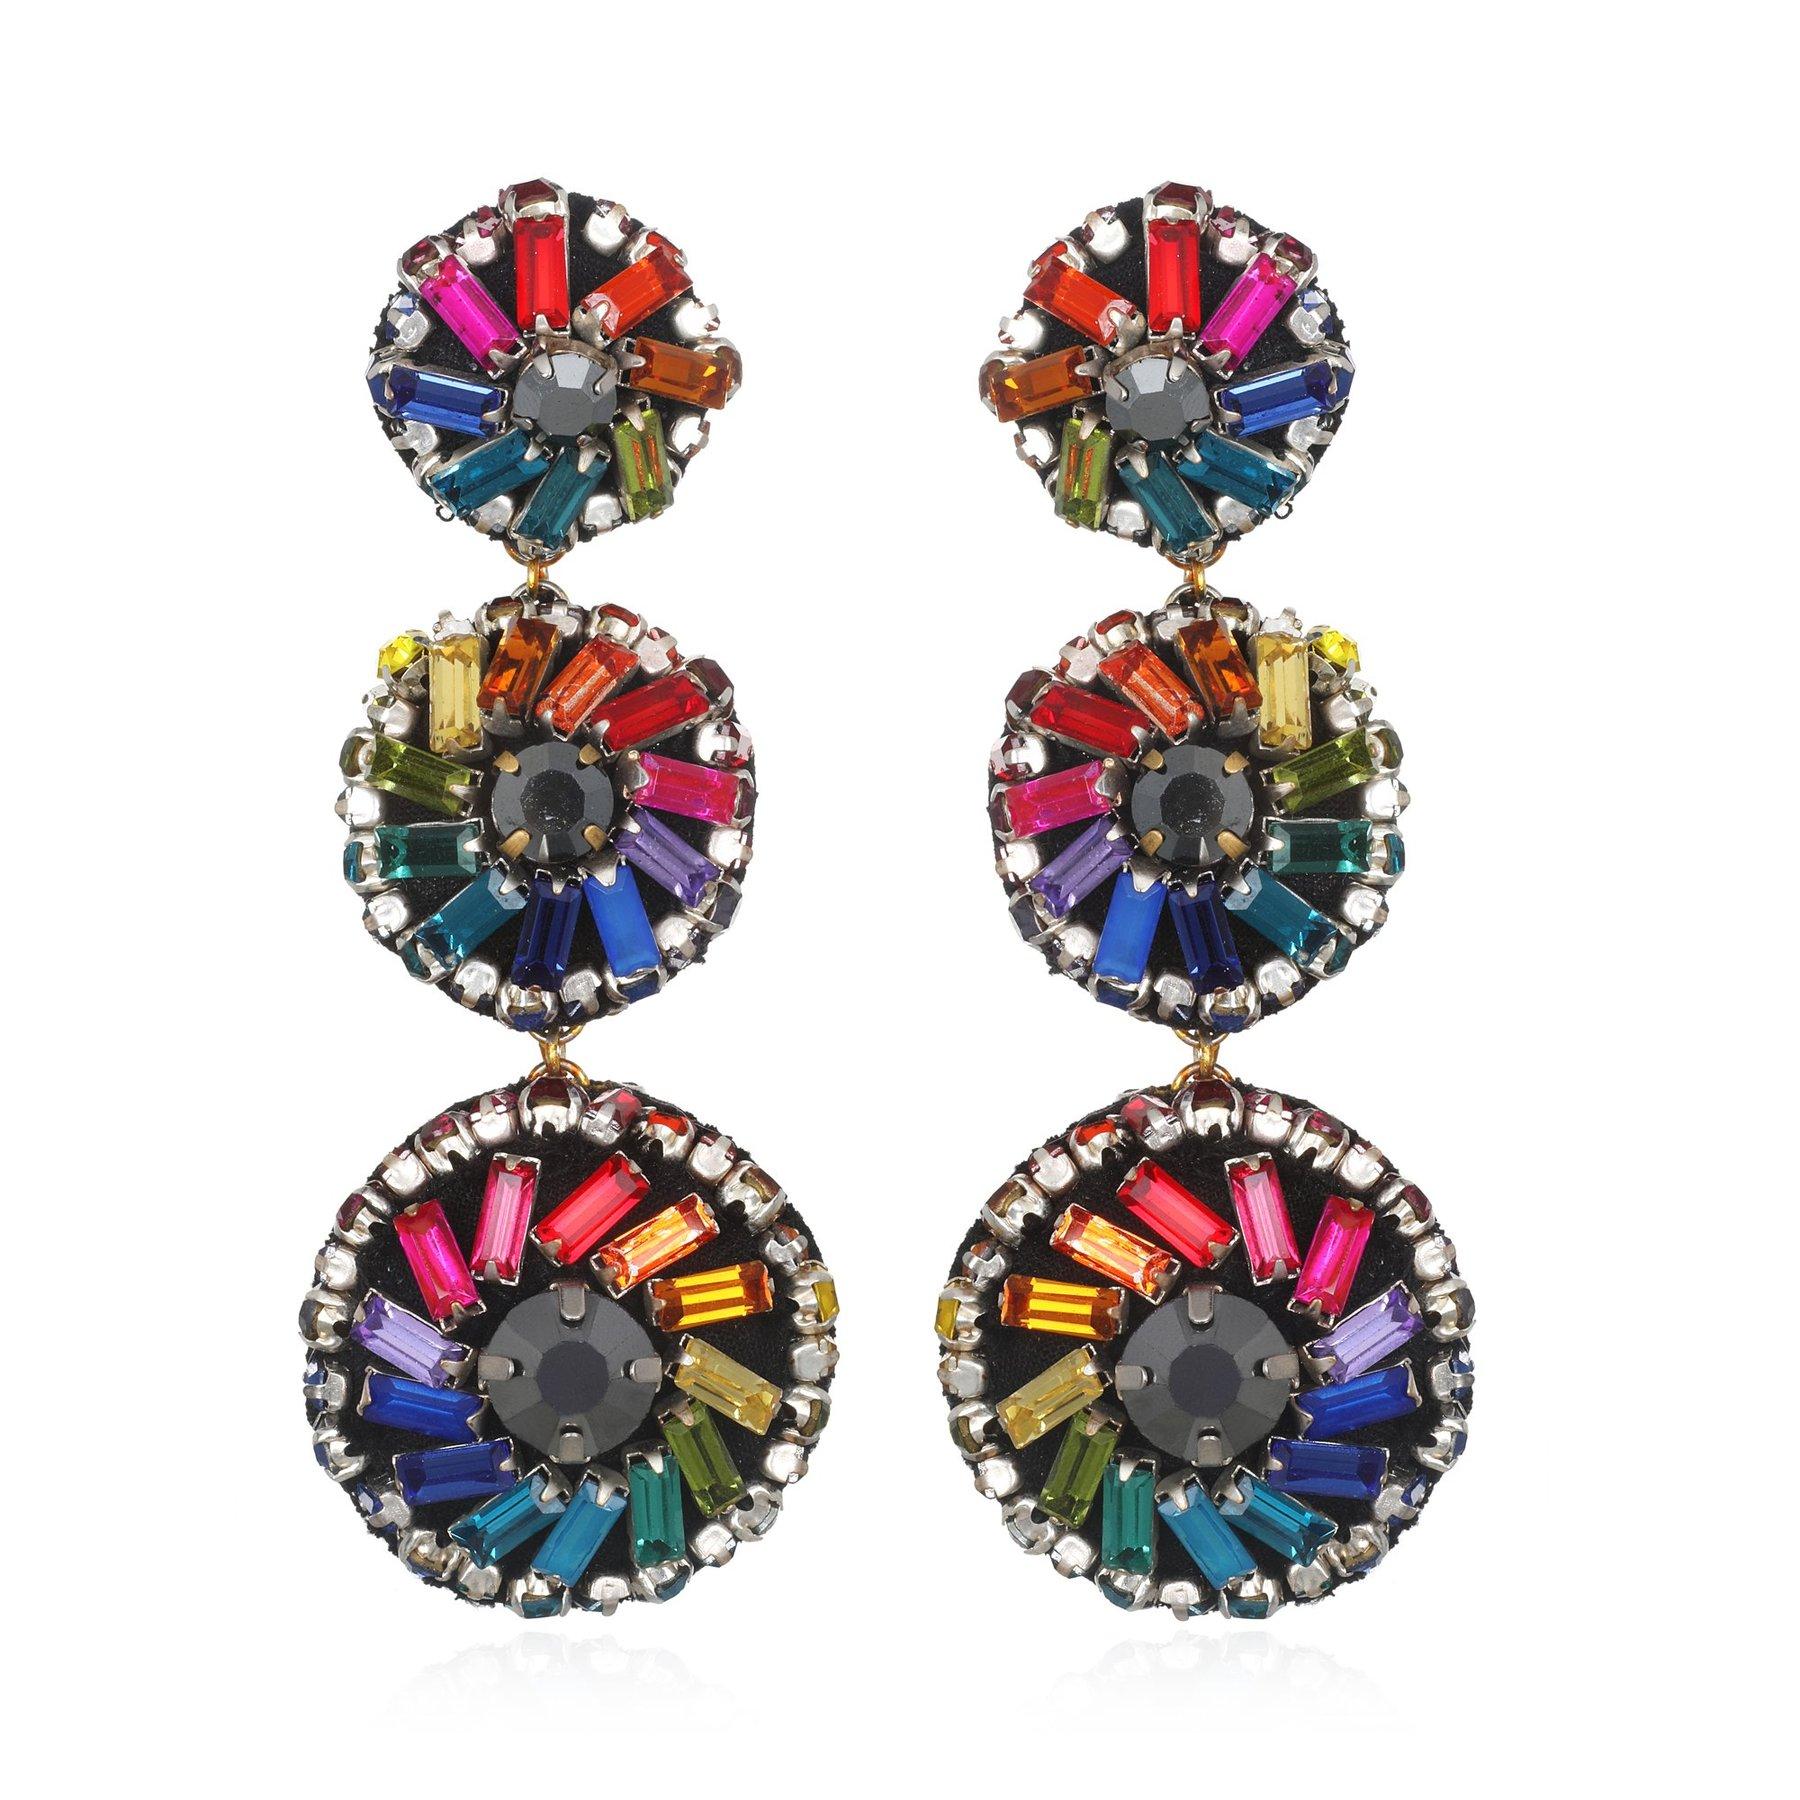 Rainbow Pinwheel Earrings by SUZANNA DAI